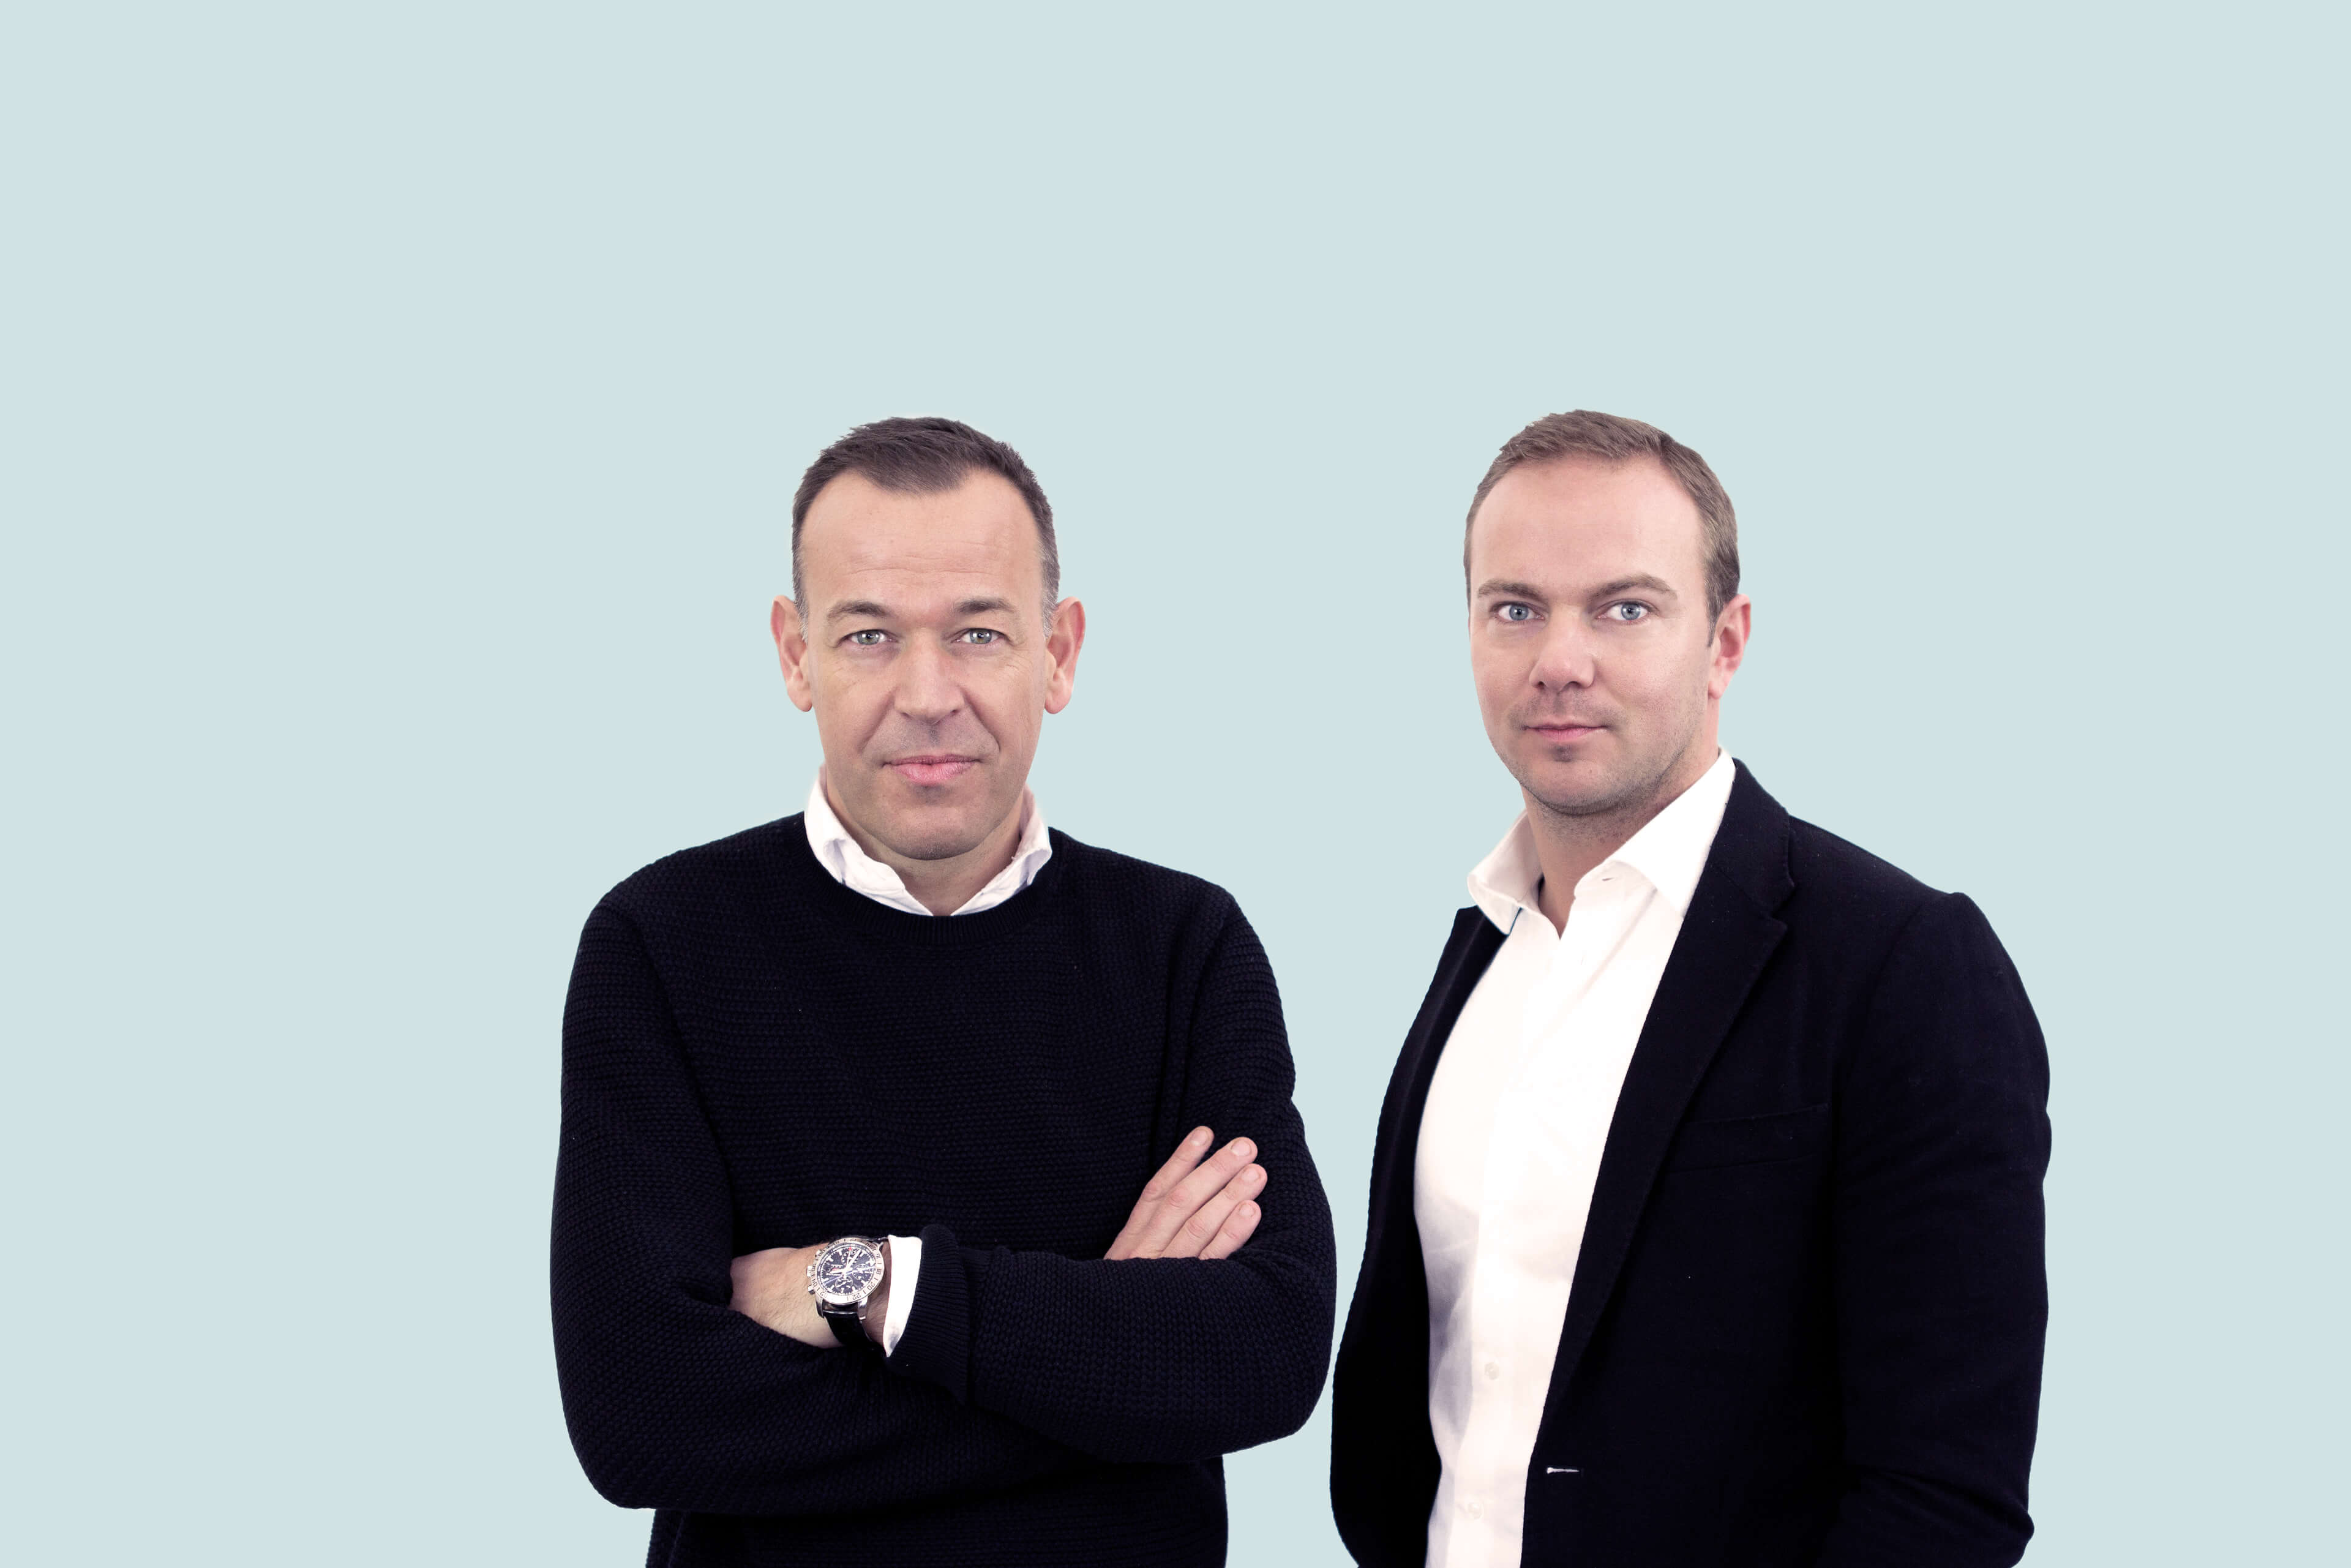 Interview met Richard van Oostenbrugge & Thomas Groot